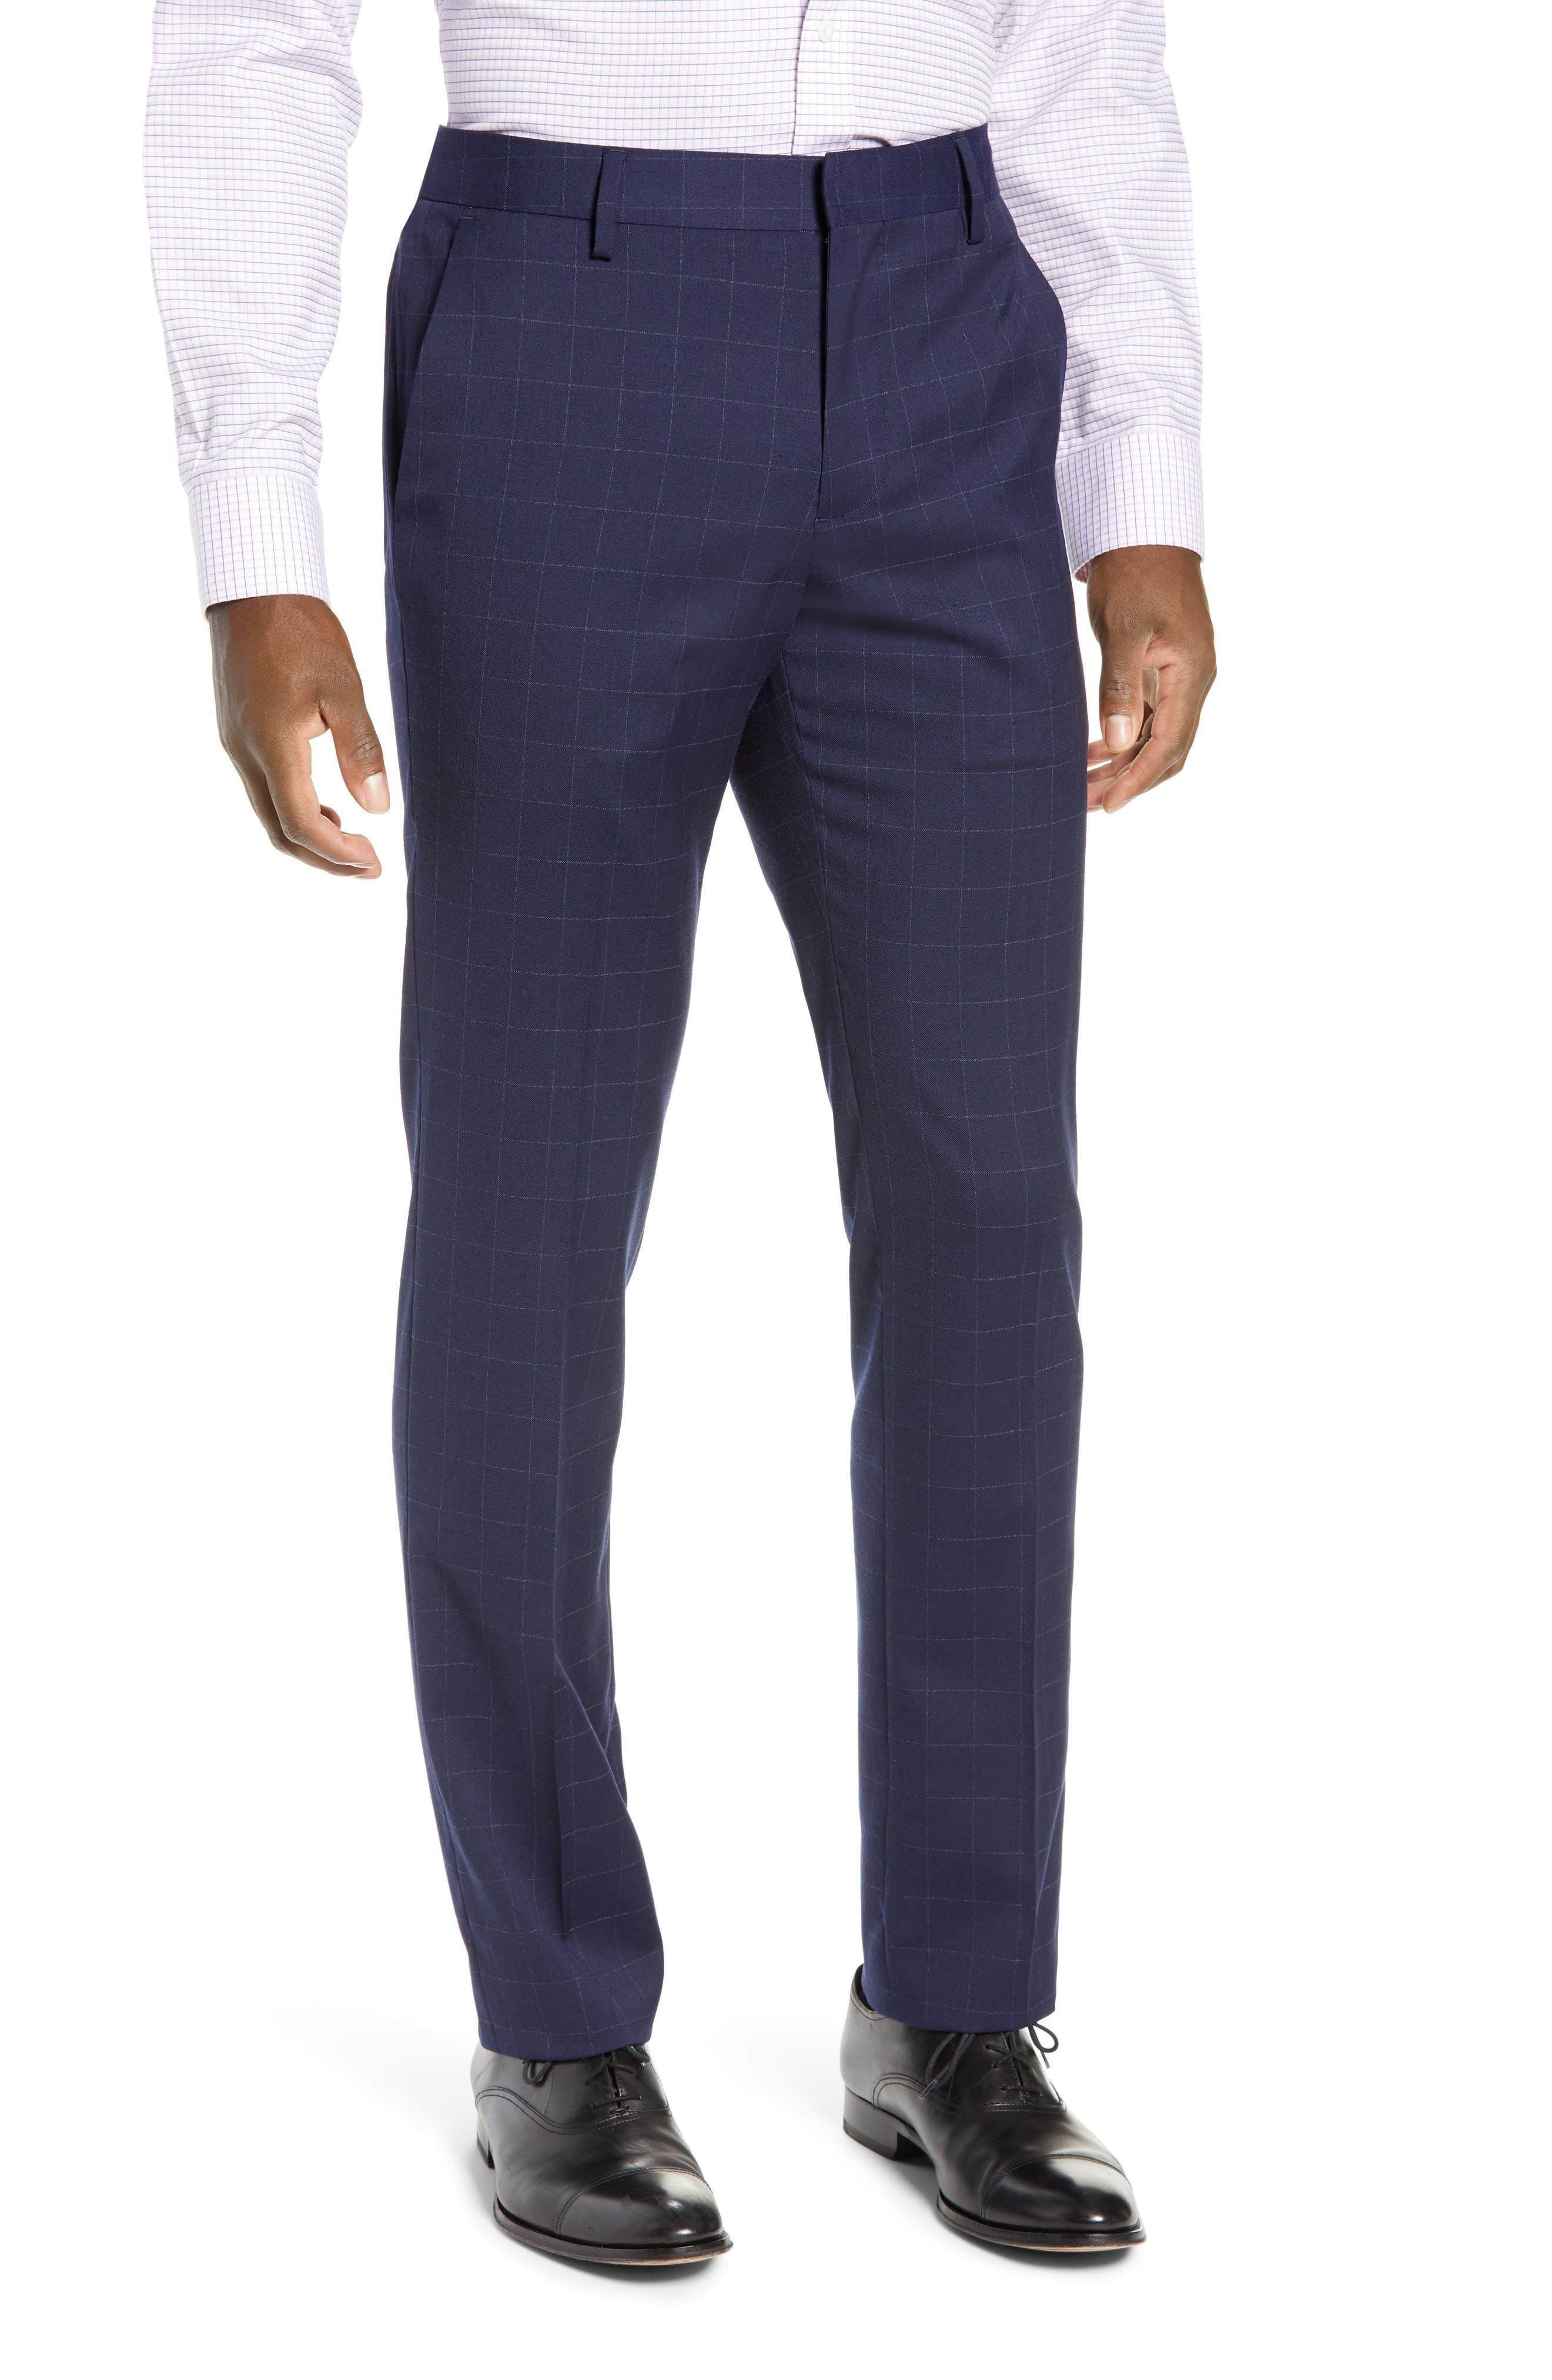 BONOBOS Jetsetter Slim Fit Stretch Suit Pants, Main, color, NAVY CHALK WINDOWPANE